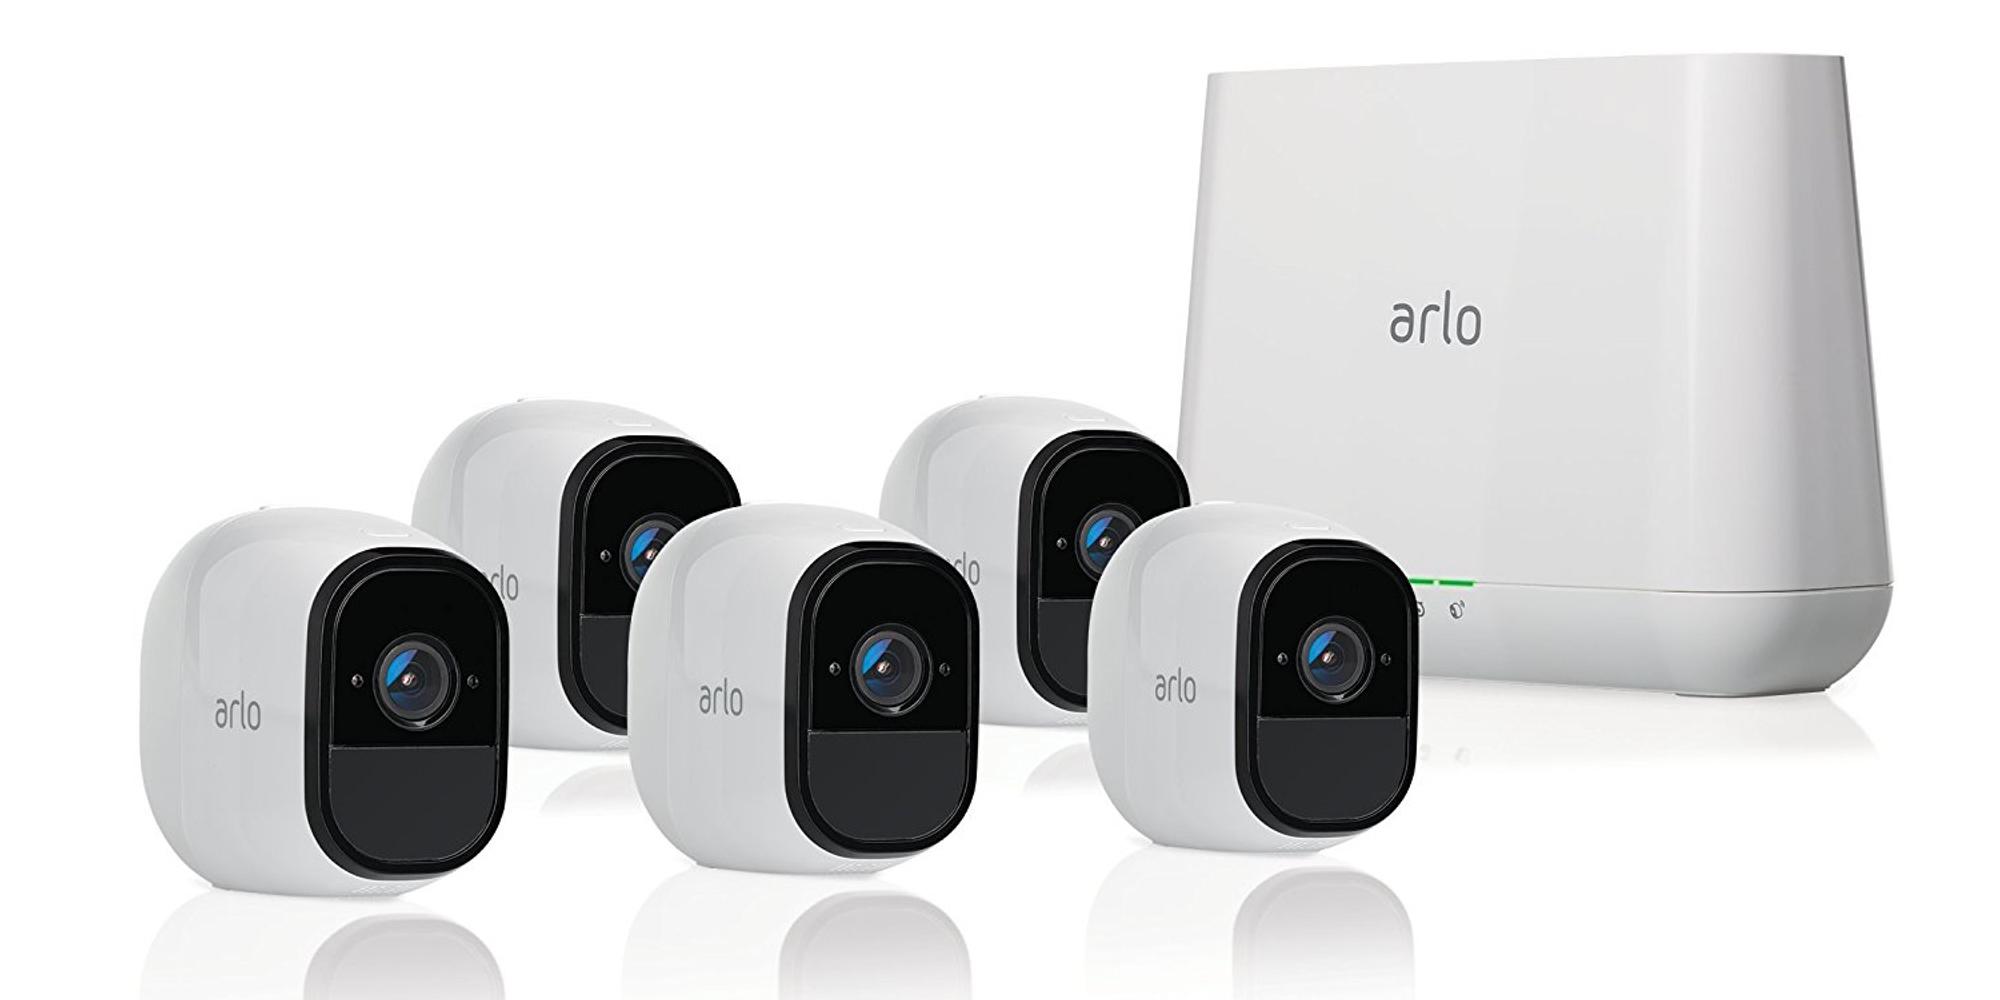 Let NETGEAR's Arlo Pro 5 camera system keep your home secure: $514 (Refurb, Reg. $775)